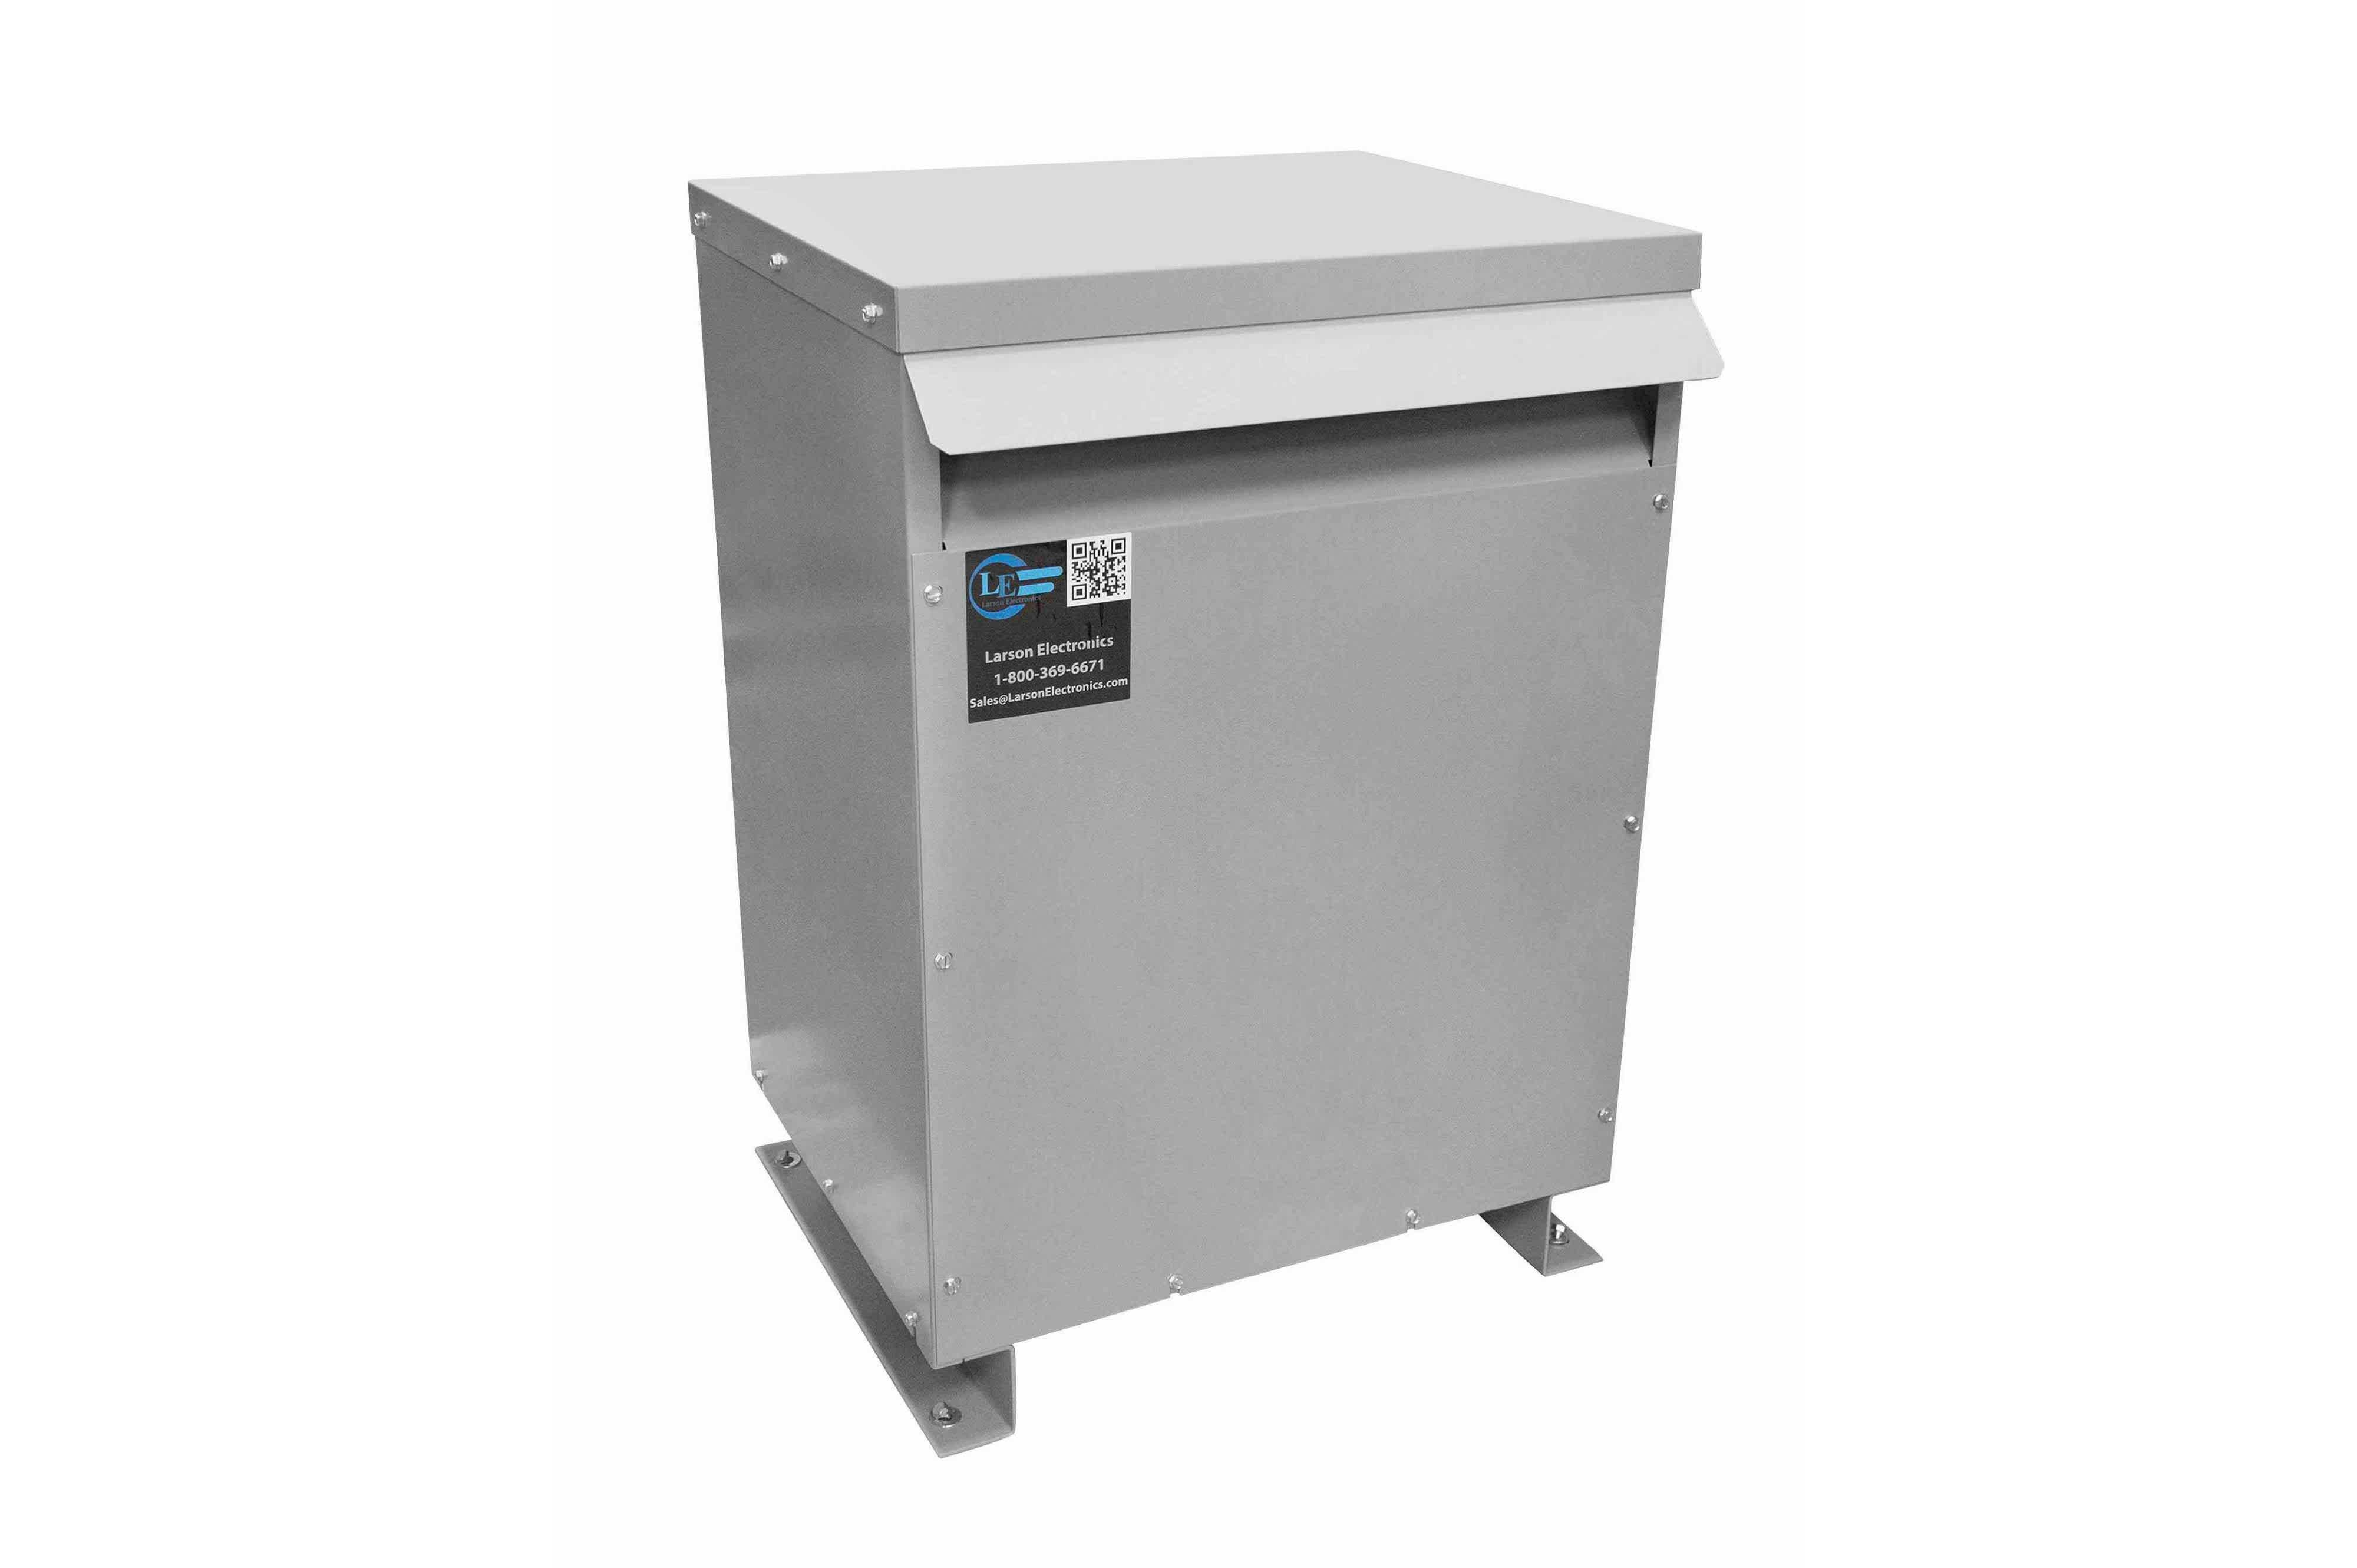 60 kVA 3PH DOE Transformer, 240V Delta Primary, 380Y/220 Wye-N Secondary, N3R, Ventilated, 60 Hz